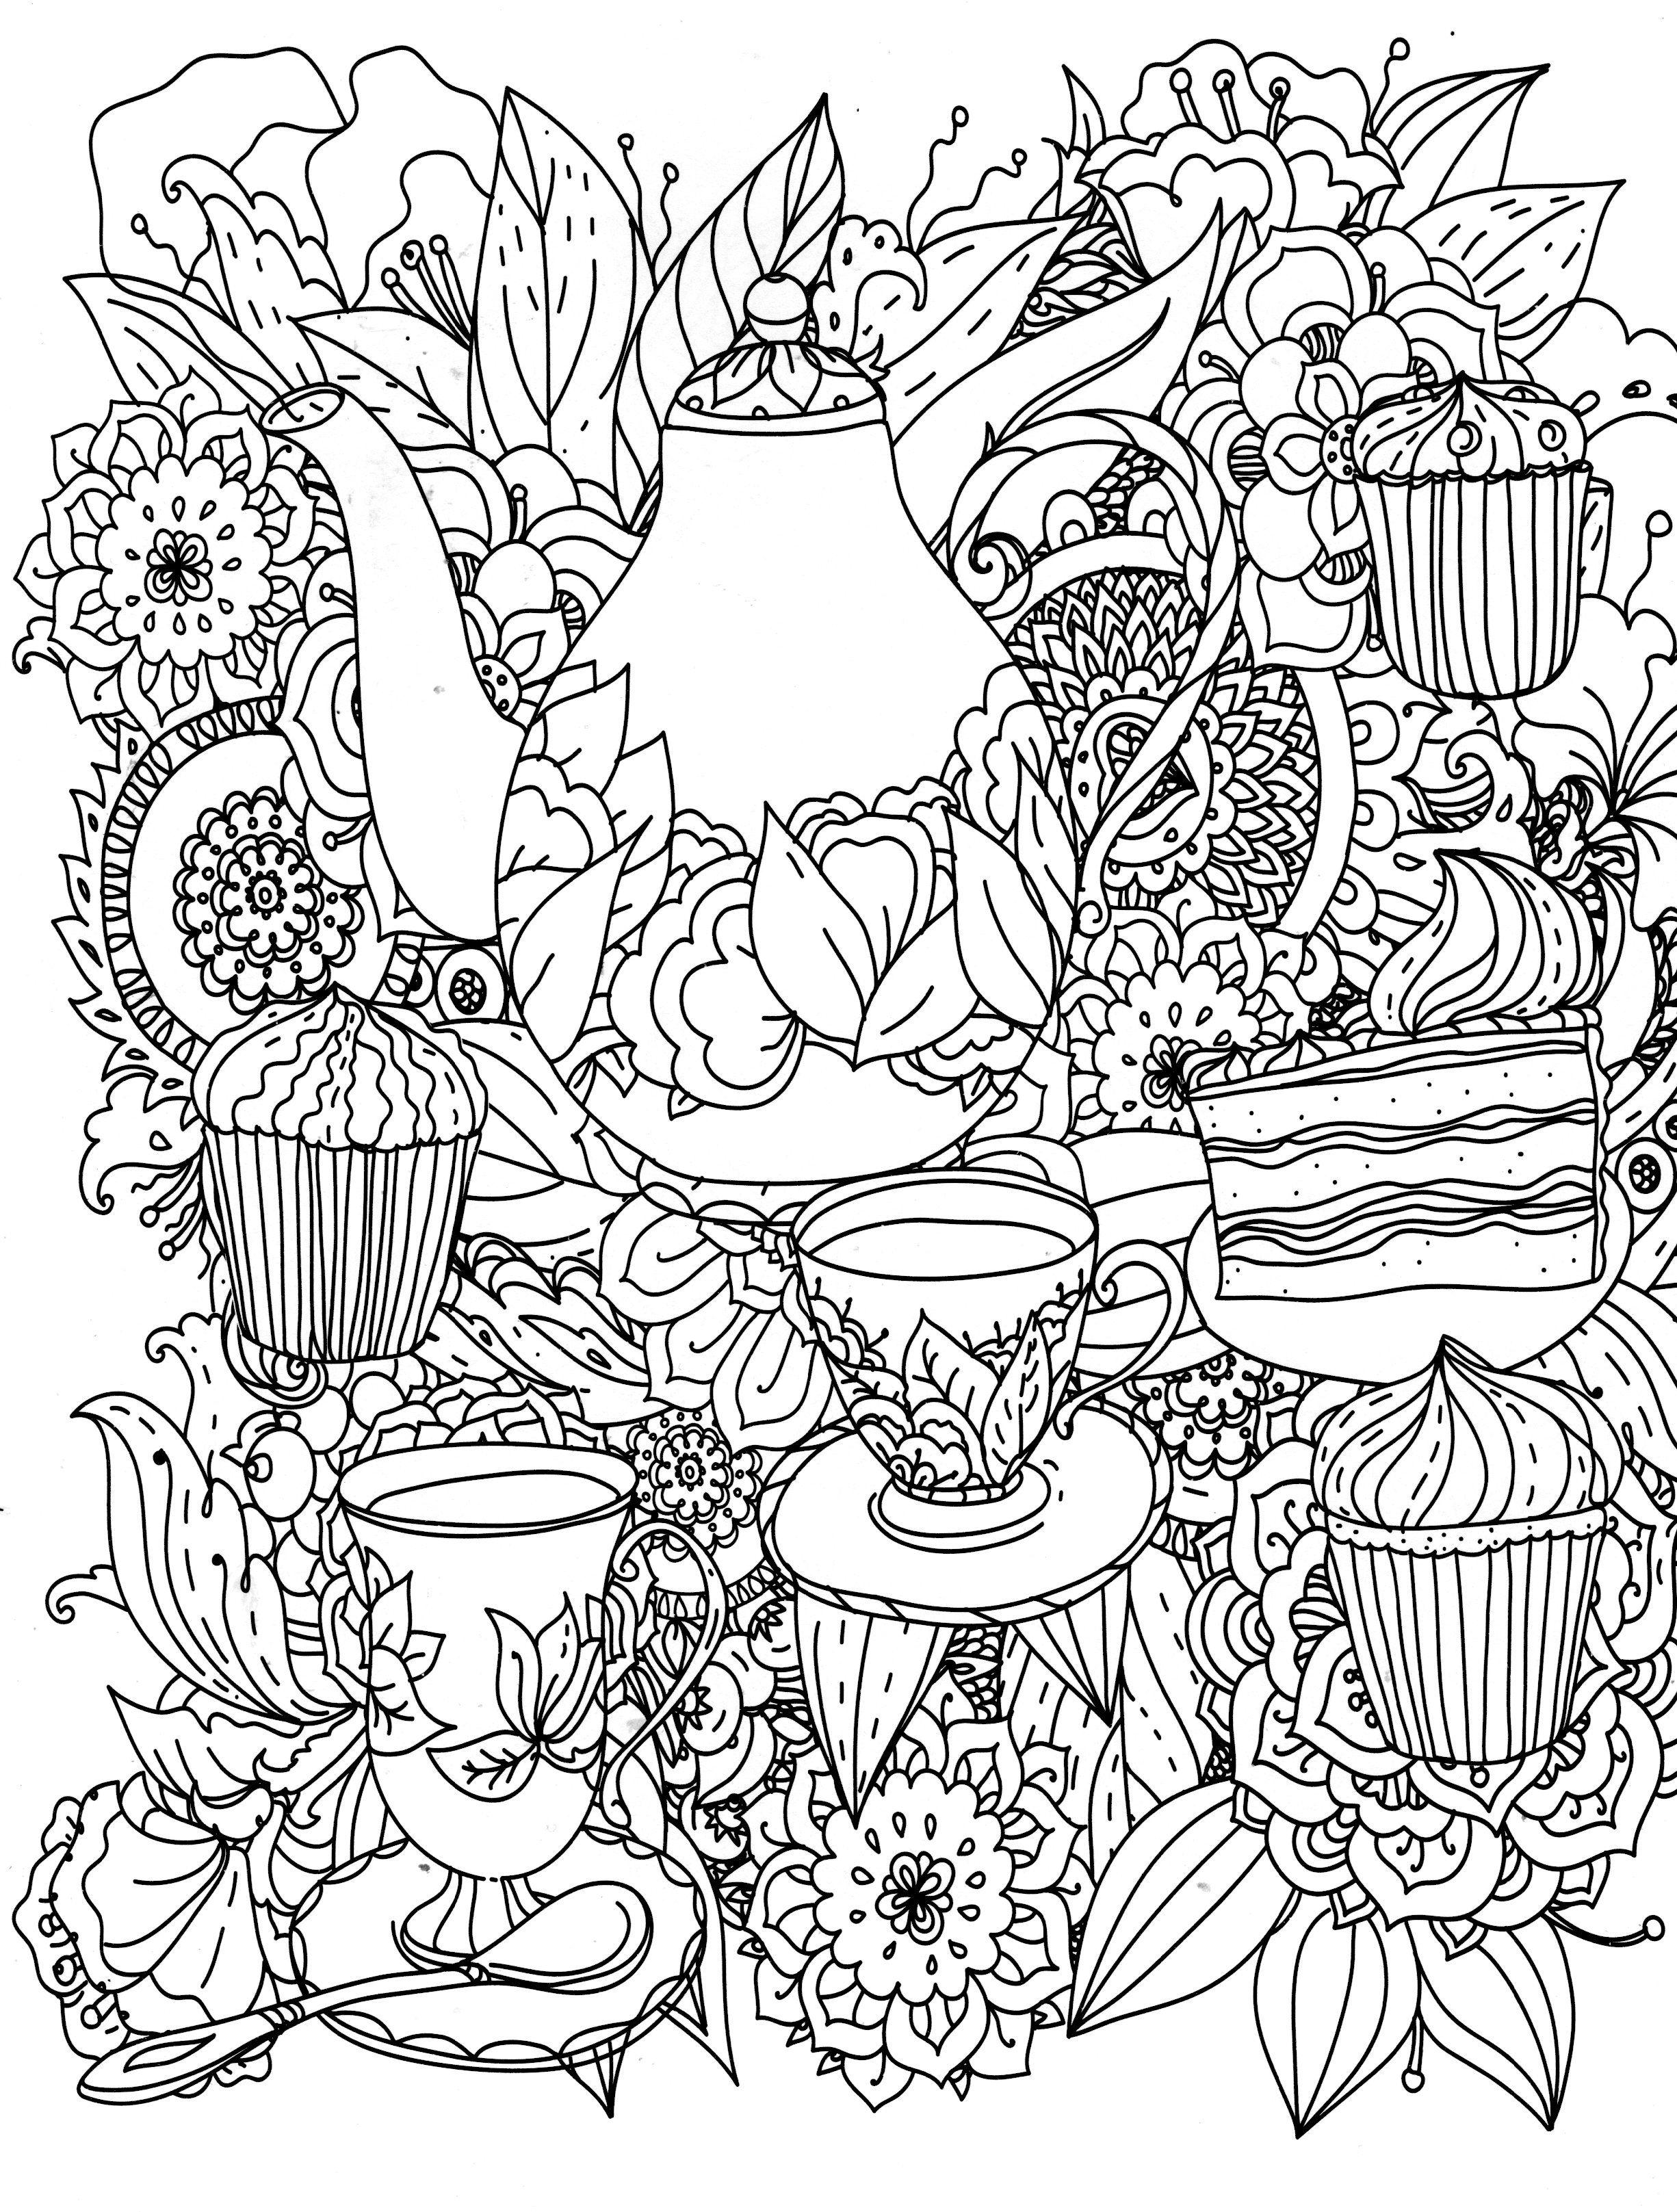 Pin de Rosa María en Dibujos 03   Pinterest   Dibujo